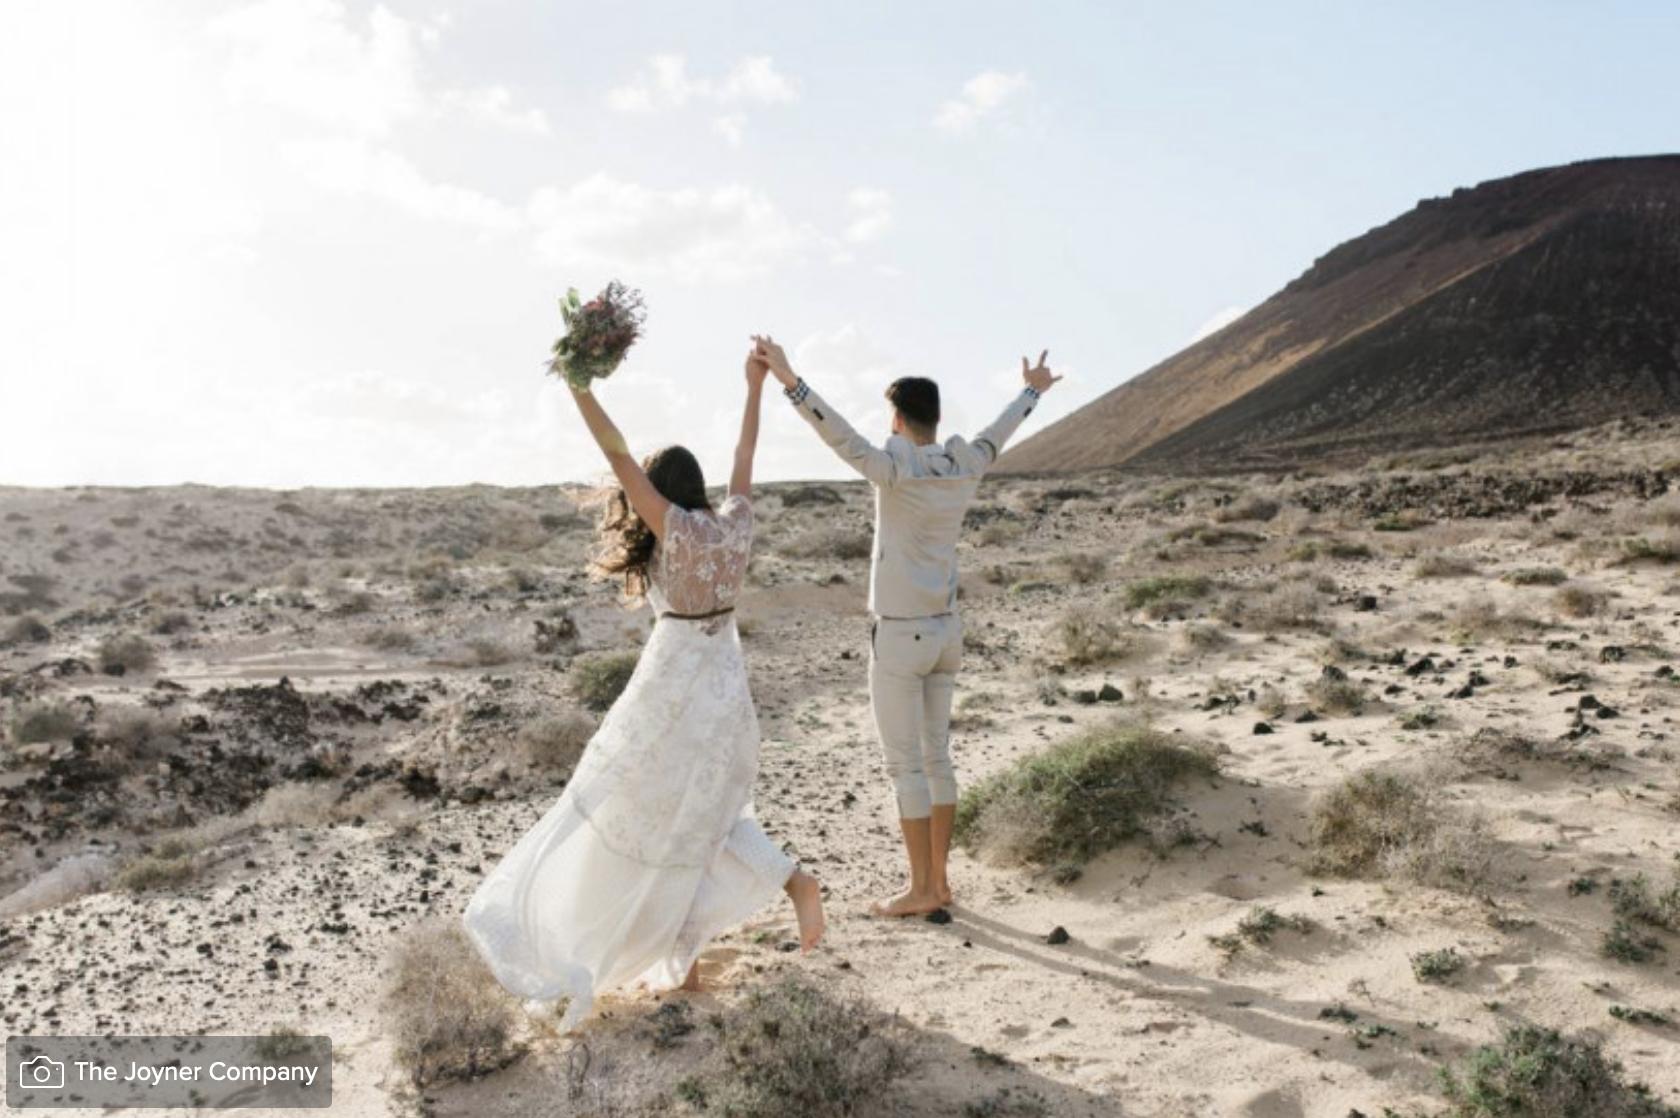 Dr. Sommerfeldt, WeddingWire.com